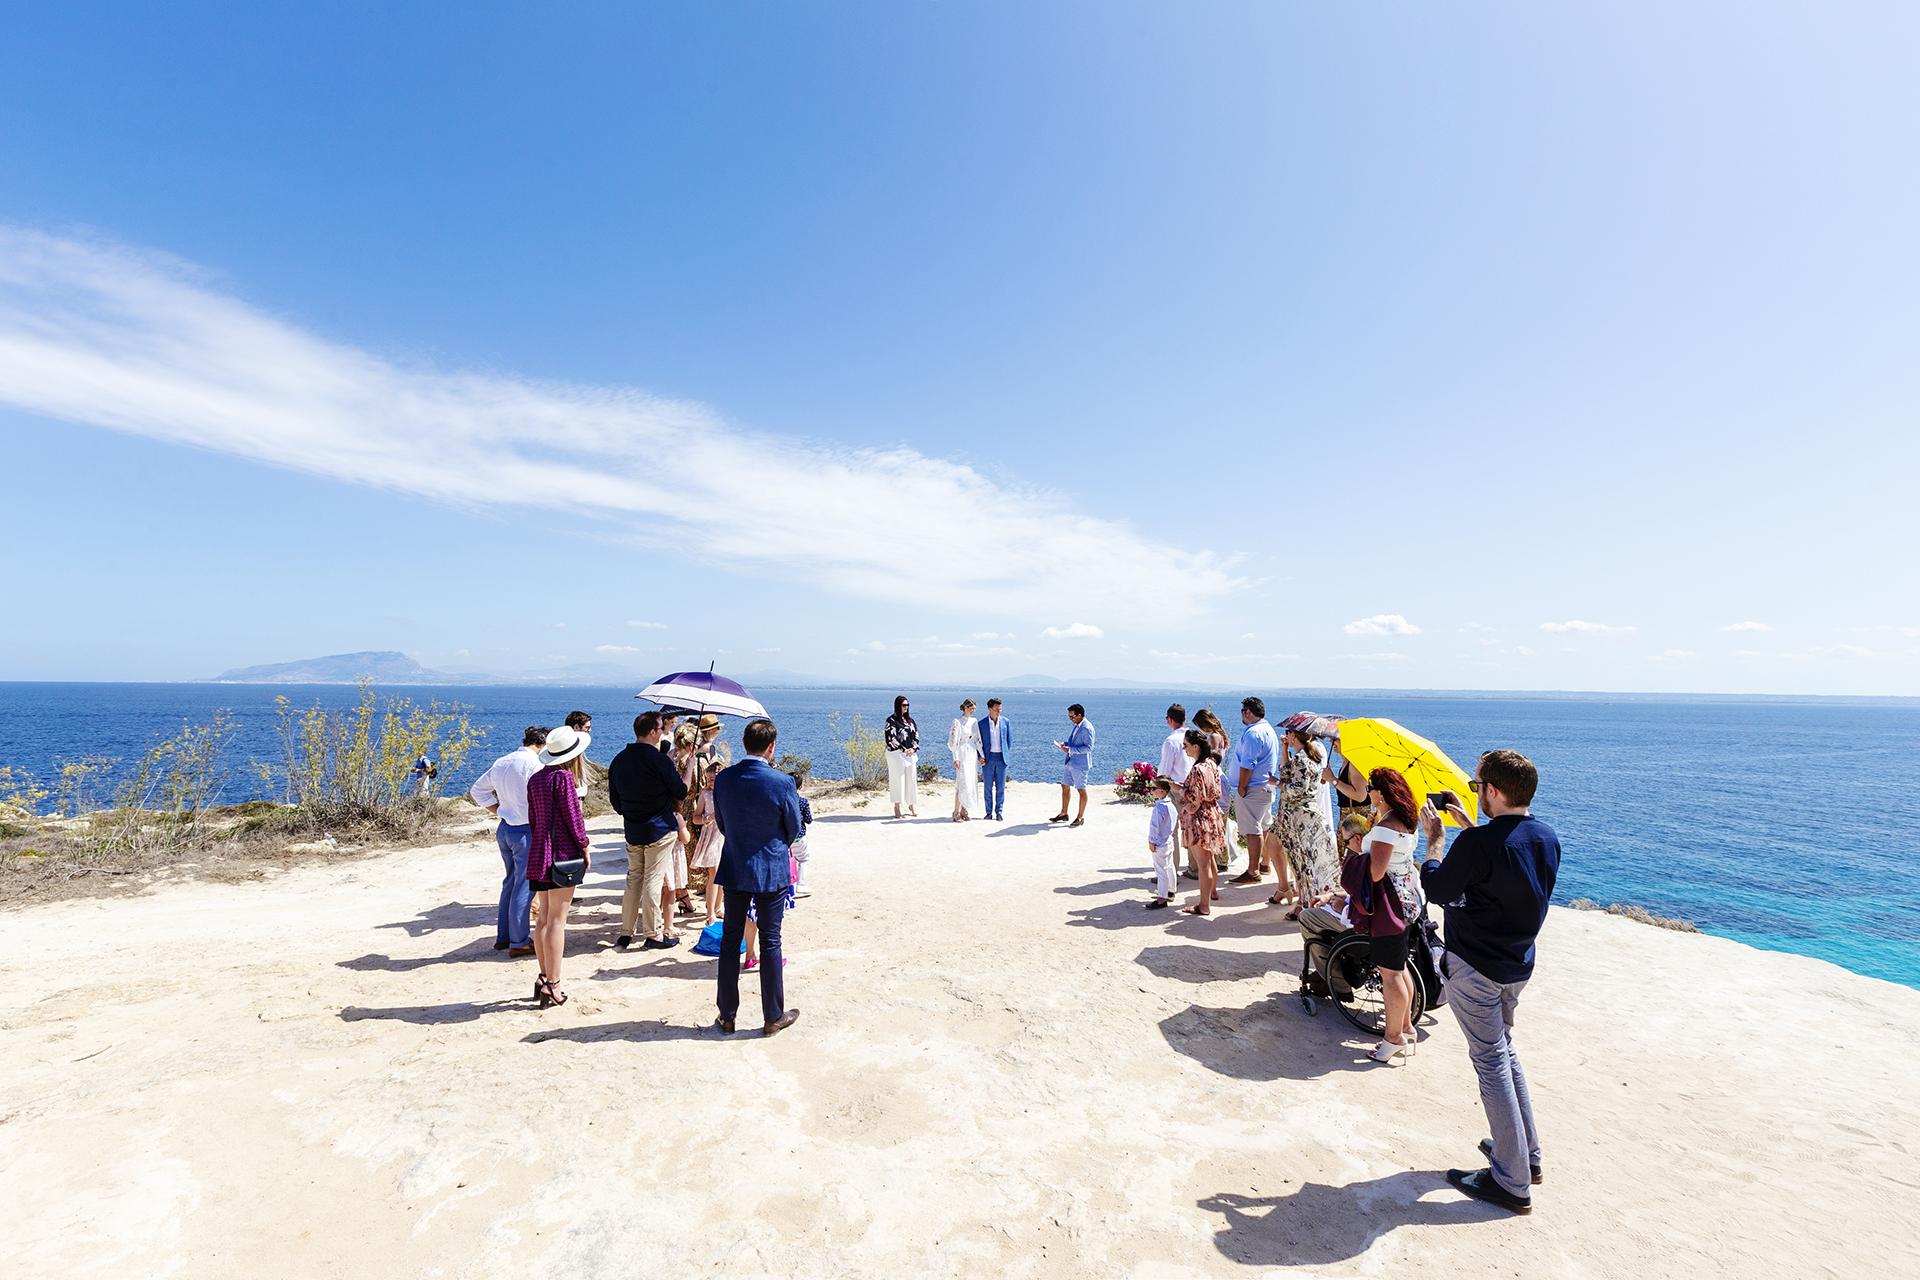 Cala Bue Marino Elopement op Sicilië | Foto - Intieme bruiloft in Favignana. Onder de hete zon van Sicilië